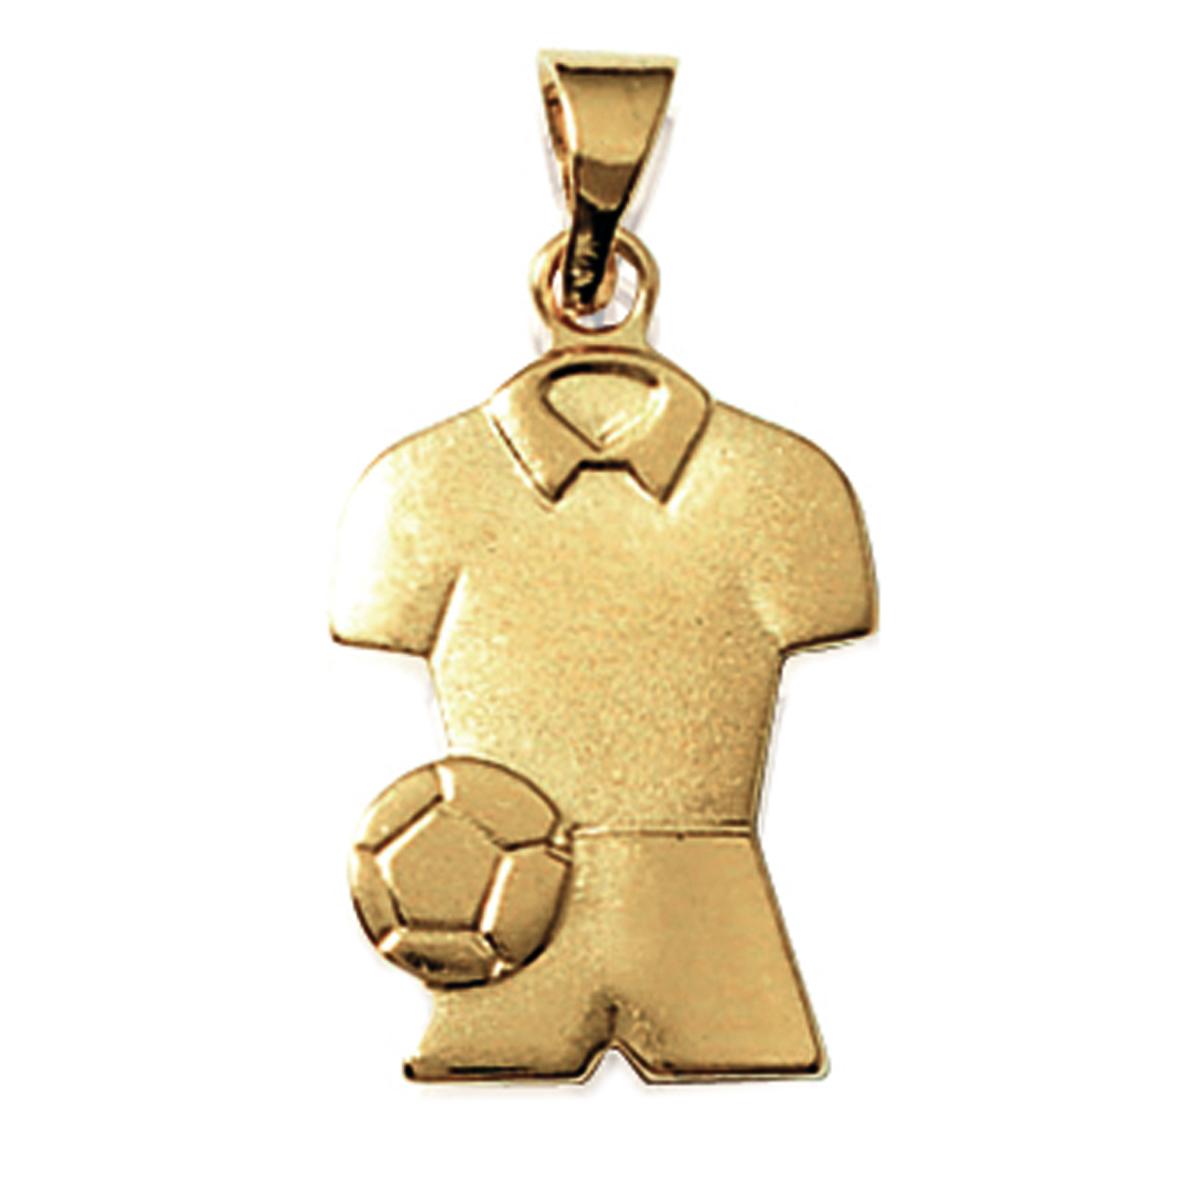 Pendentif Plaqué Or \'Passion Football\' doré - 18x13 mm - [K9330]